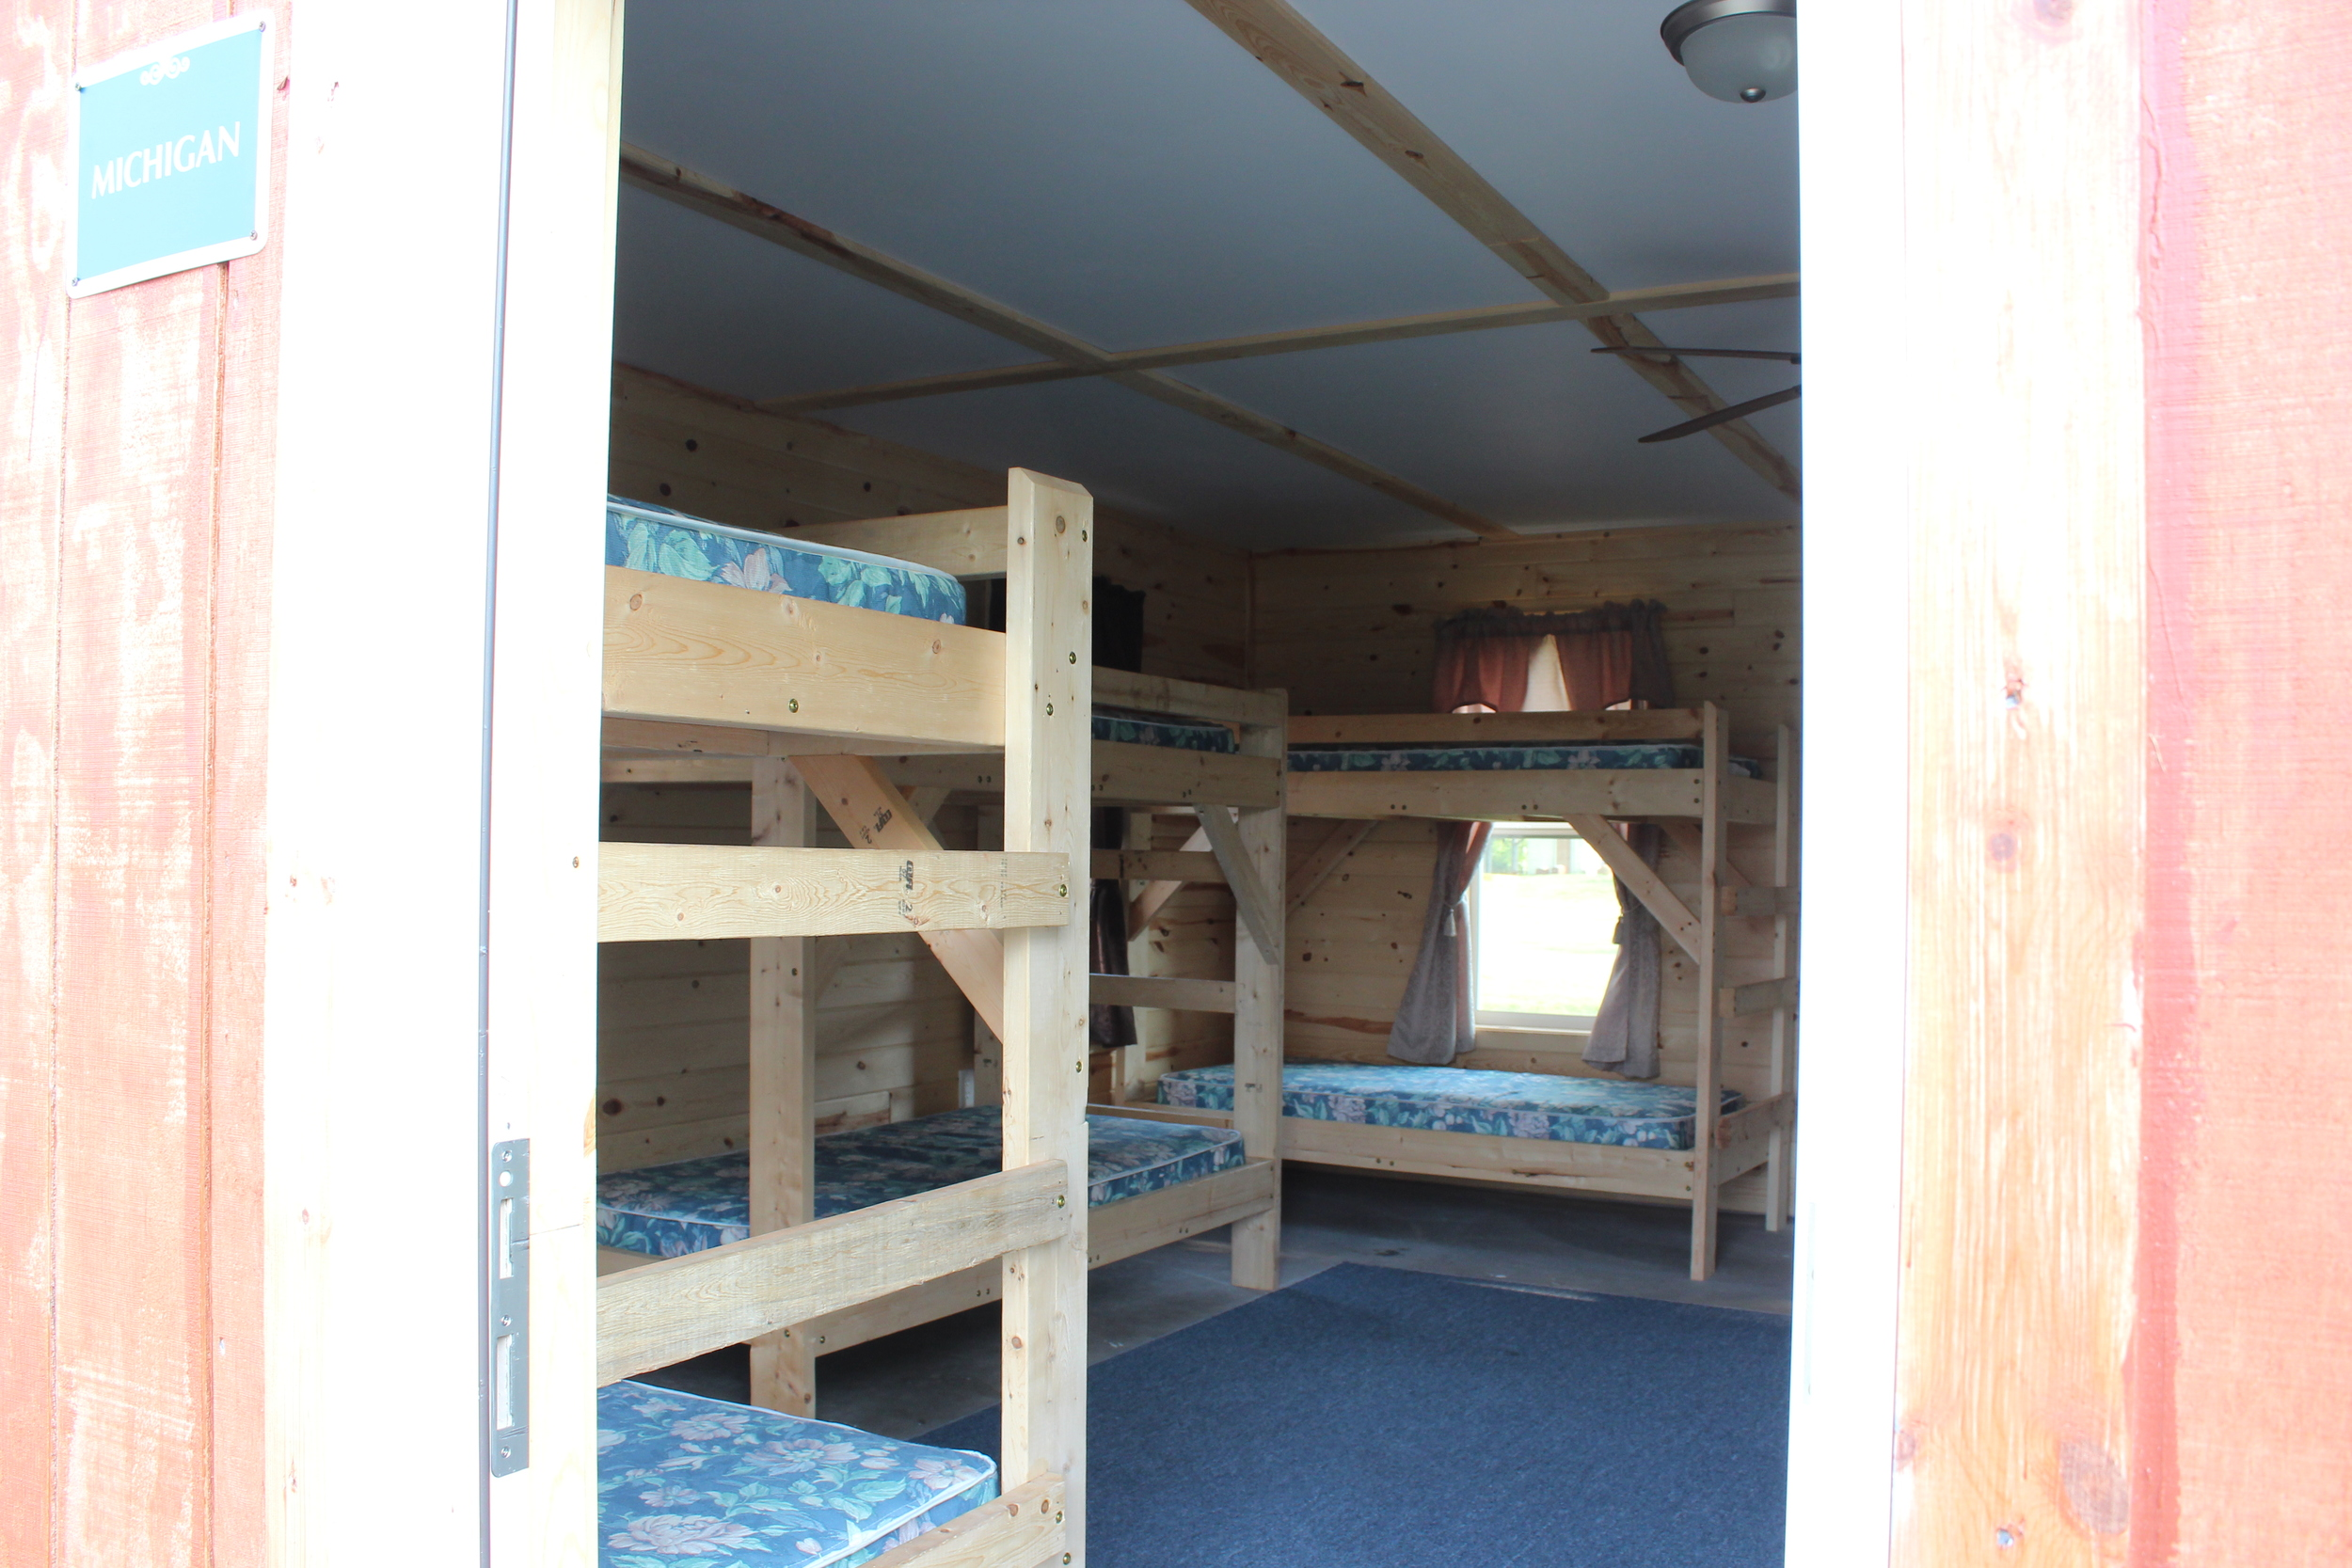 Inside Michigan dorm